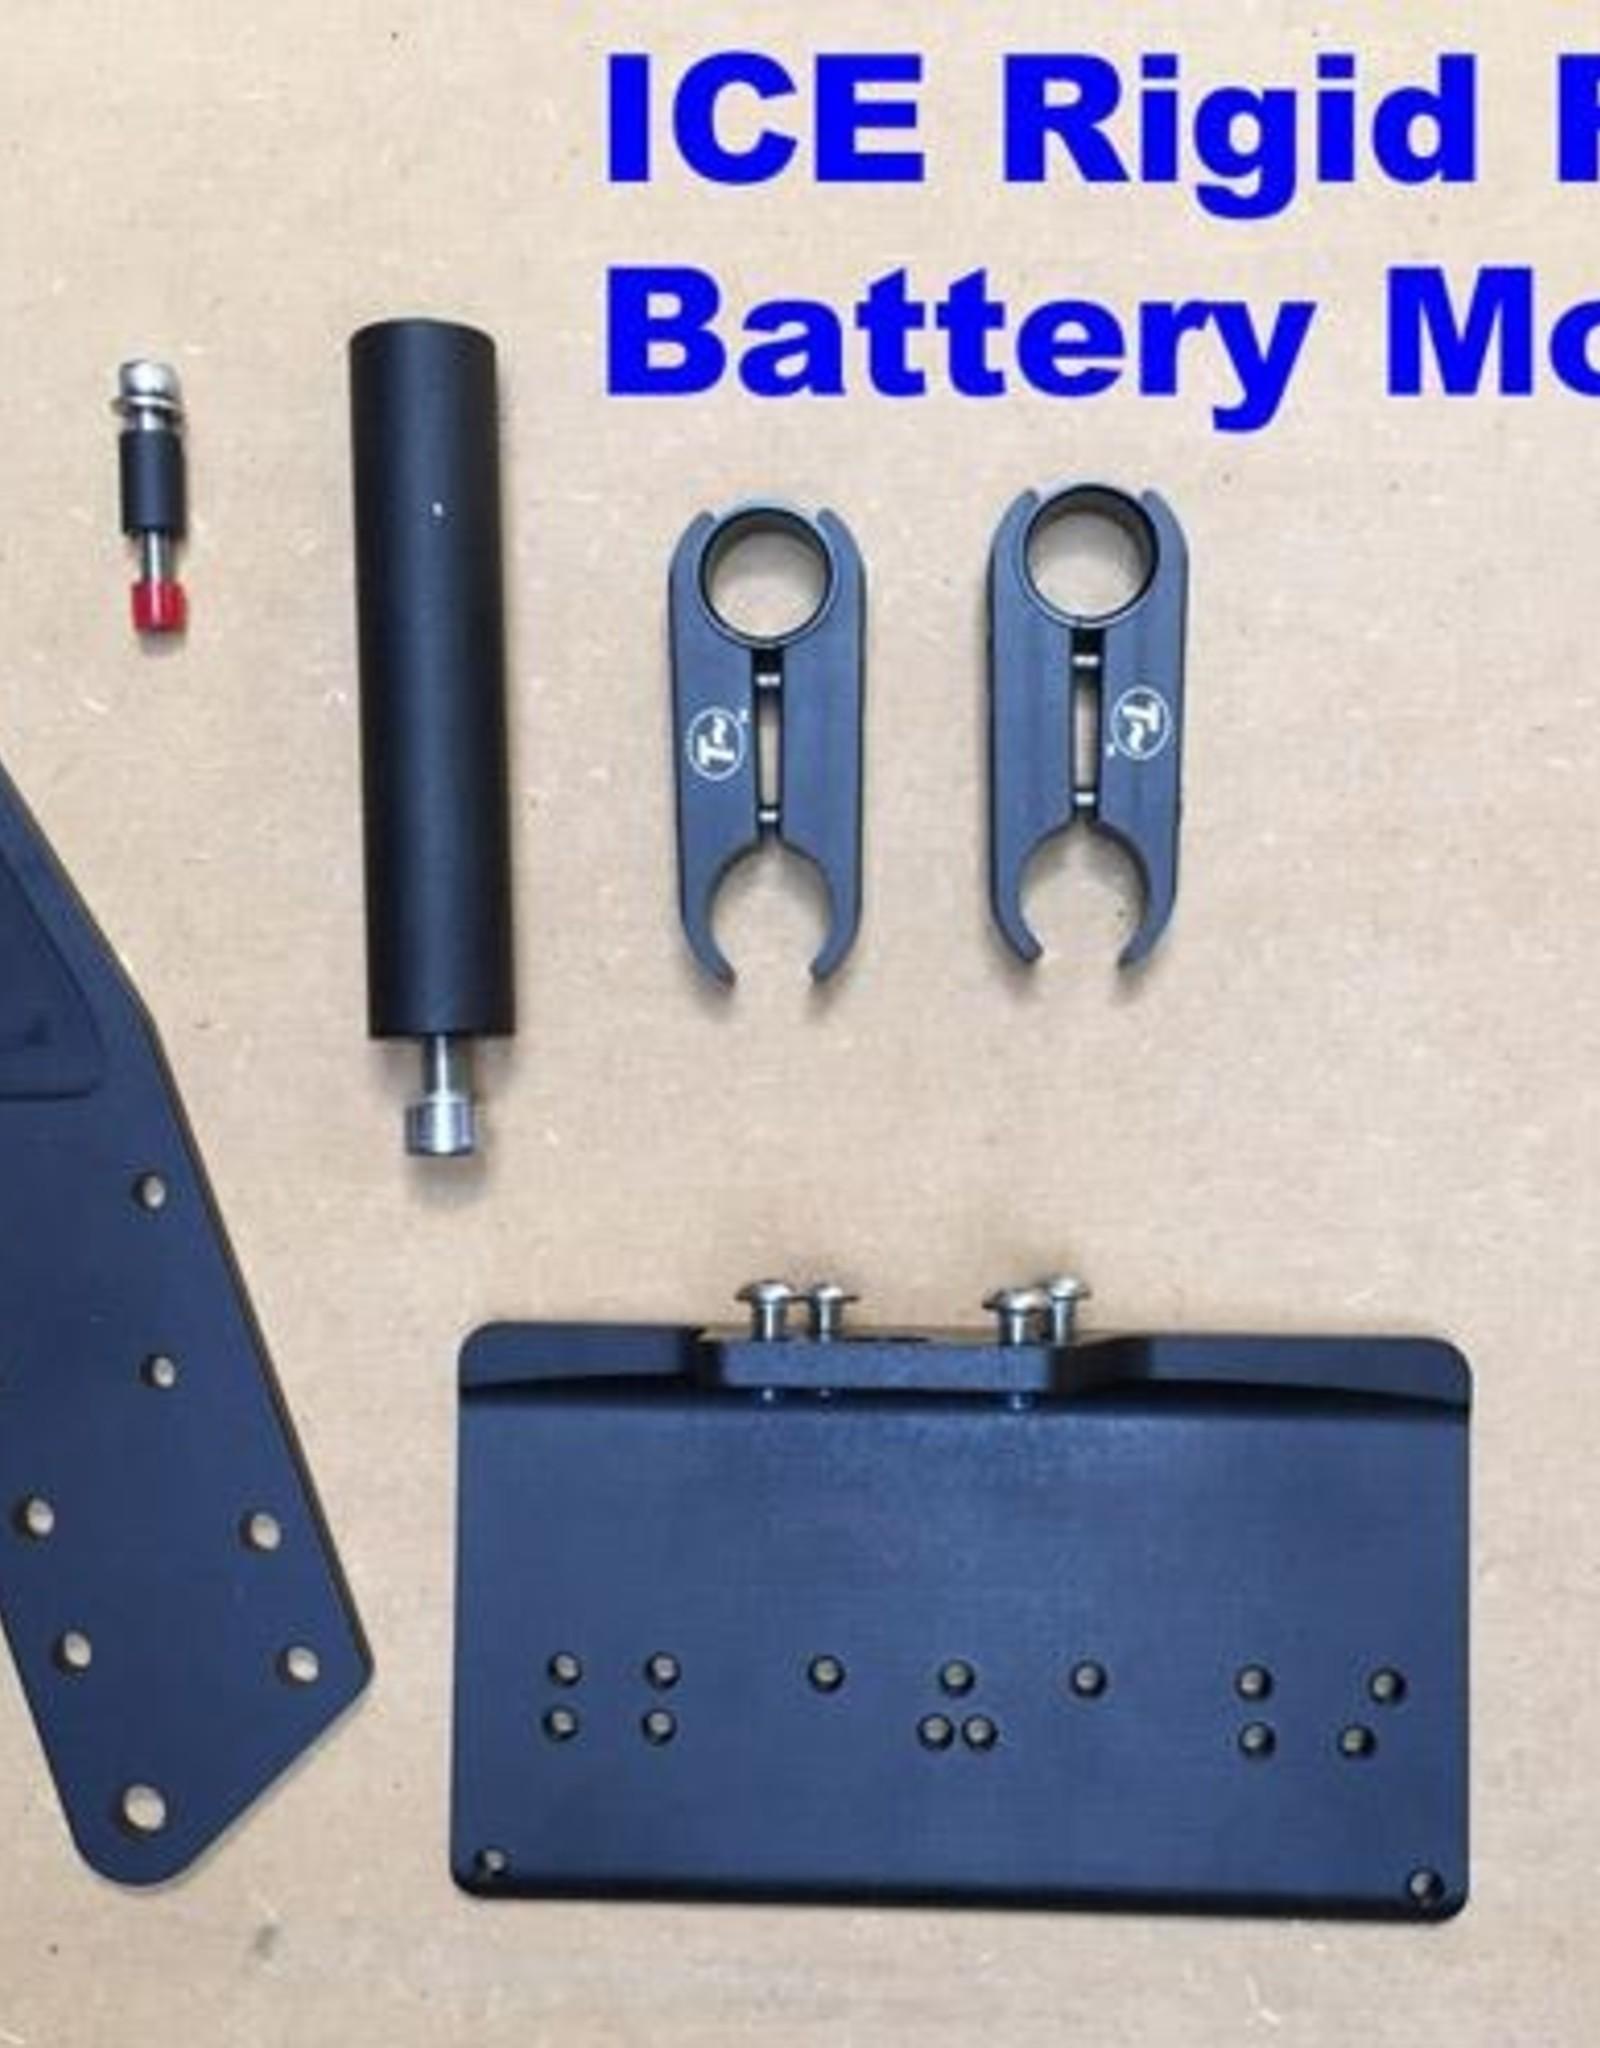 ICE Configured Battery Mount - Rigid Rear